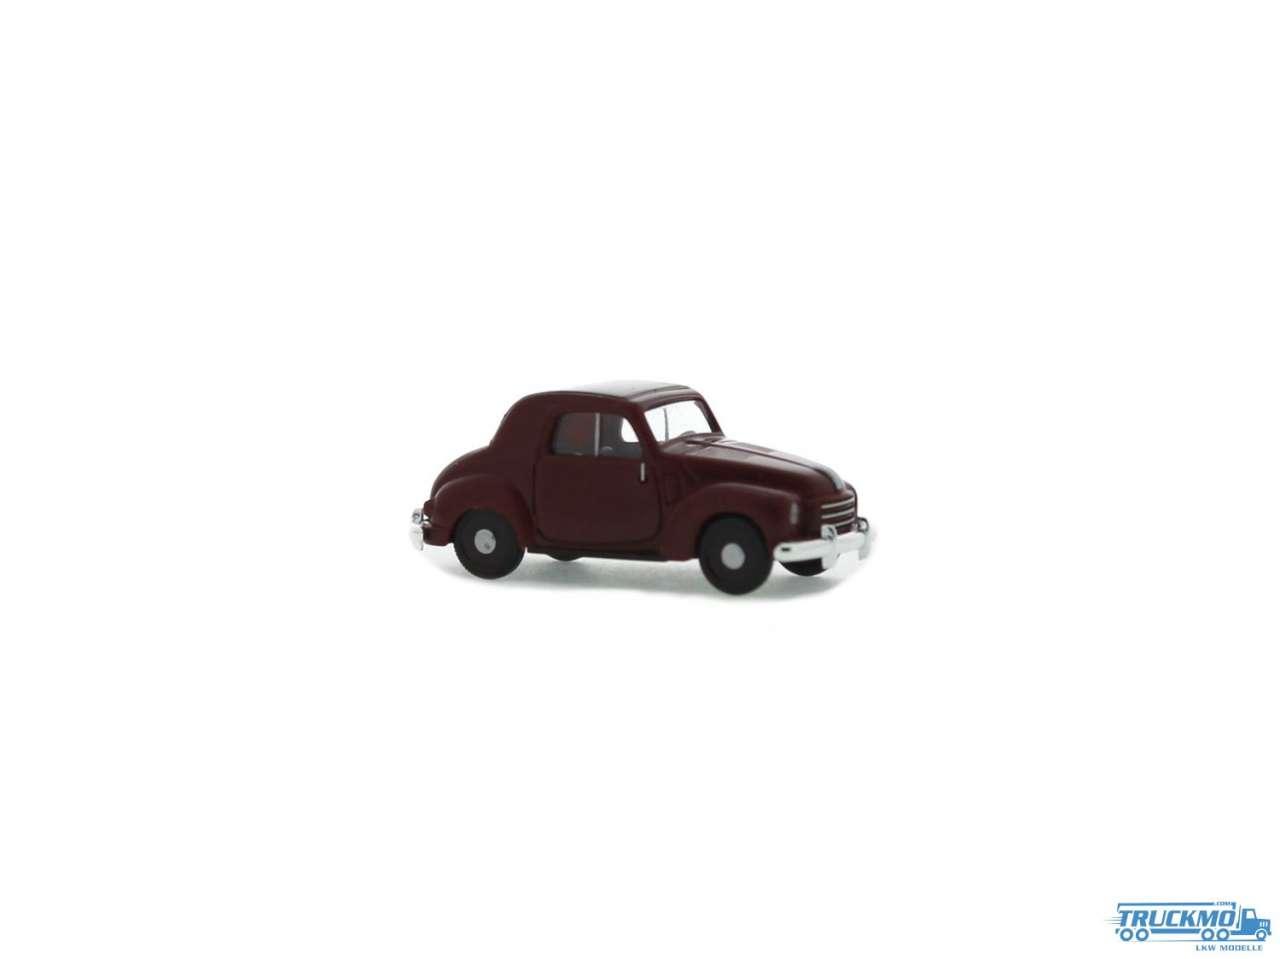 Rietze Fiat 500 C Topolino Limousine weinrot 83100